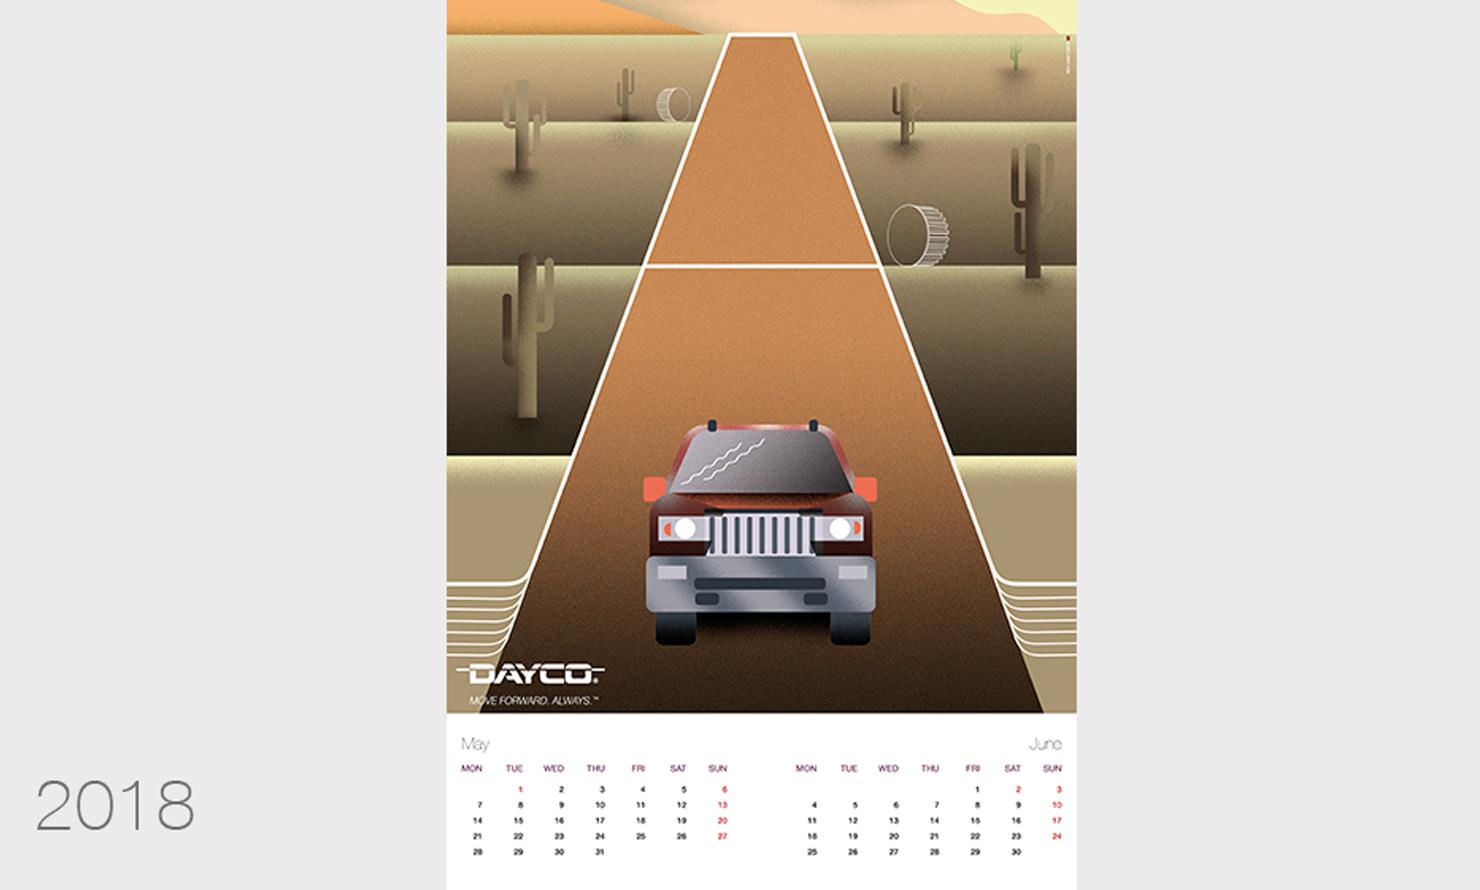 https://www.kubelibre.com/uploads/Slider-work-tutti-clienti/dayco-calendario-2018-3.jpg